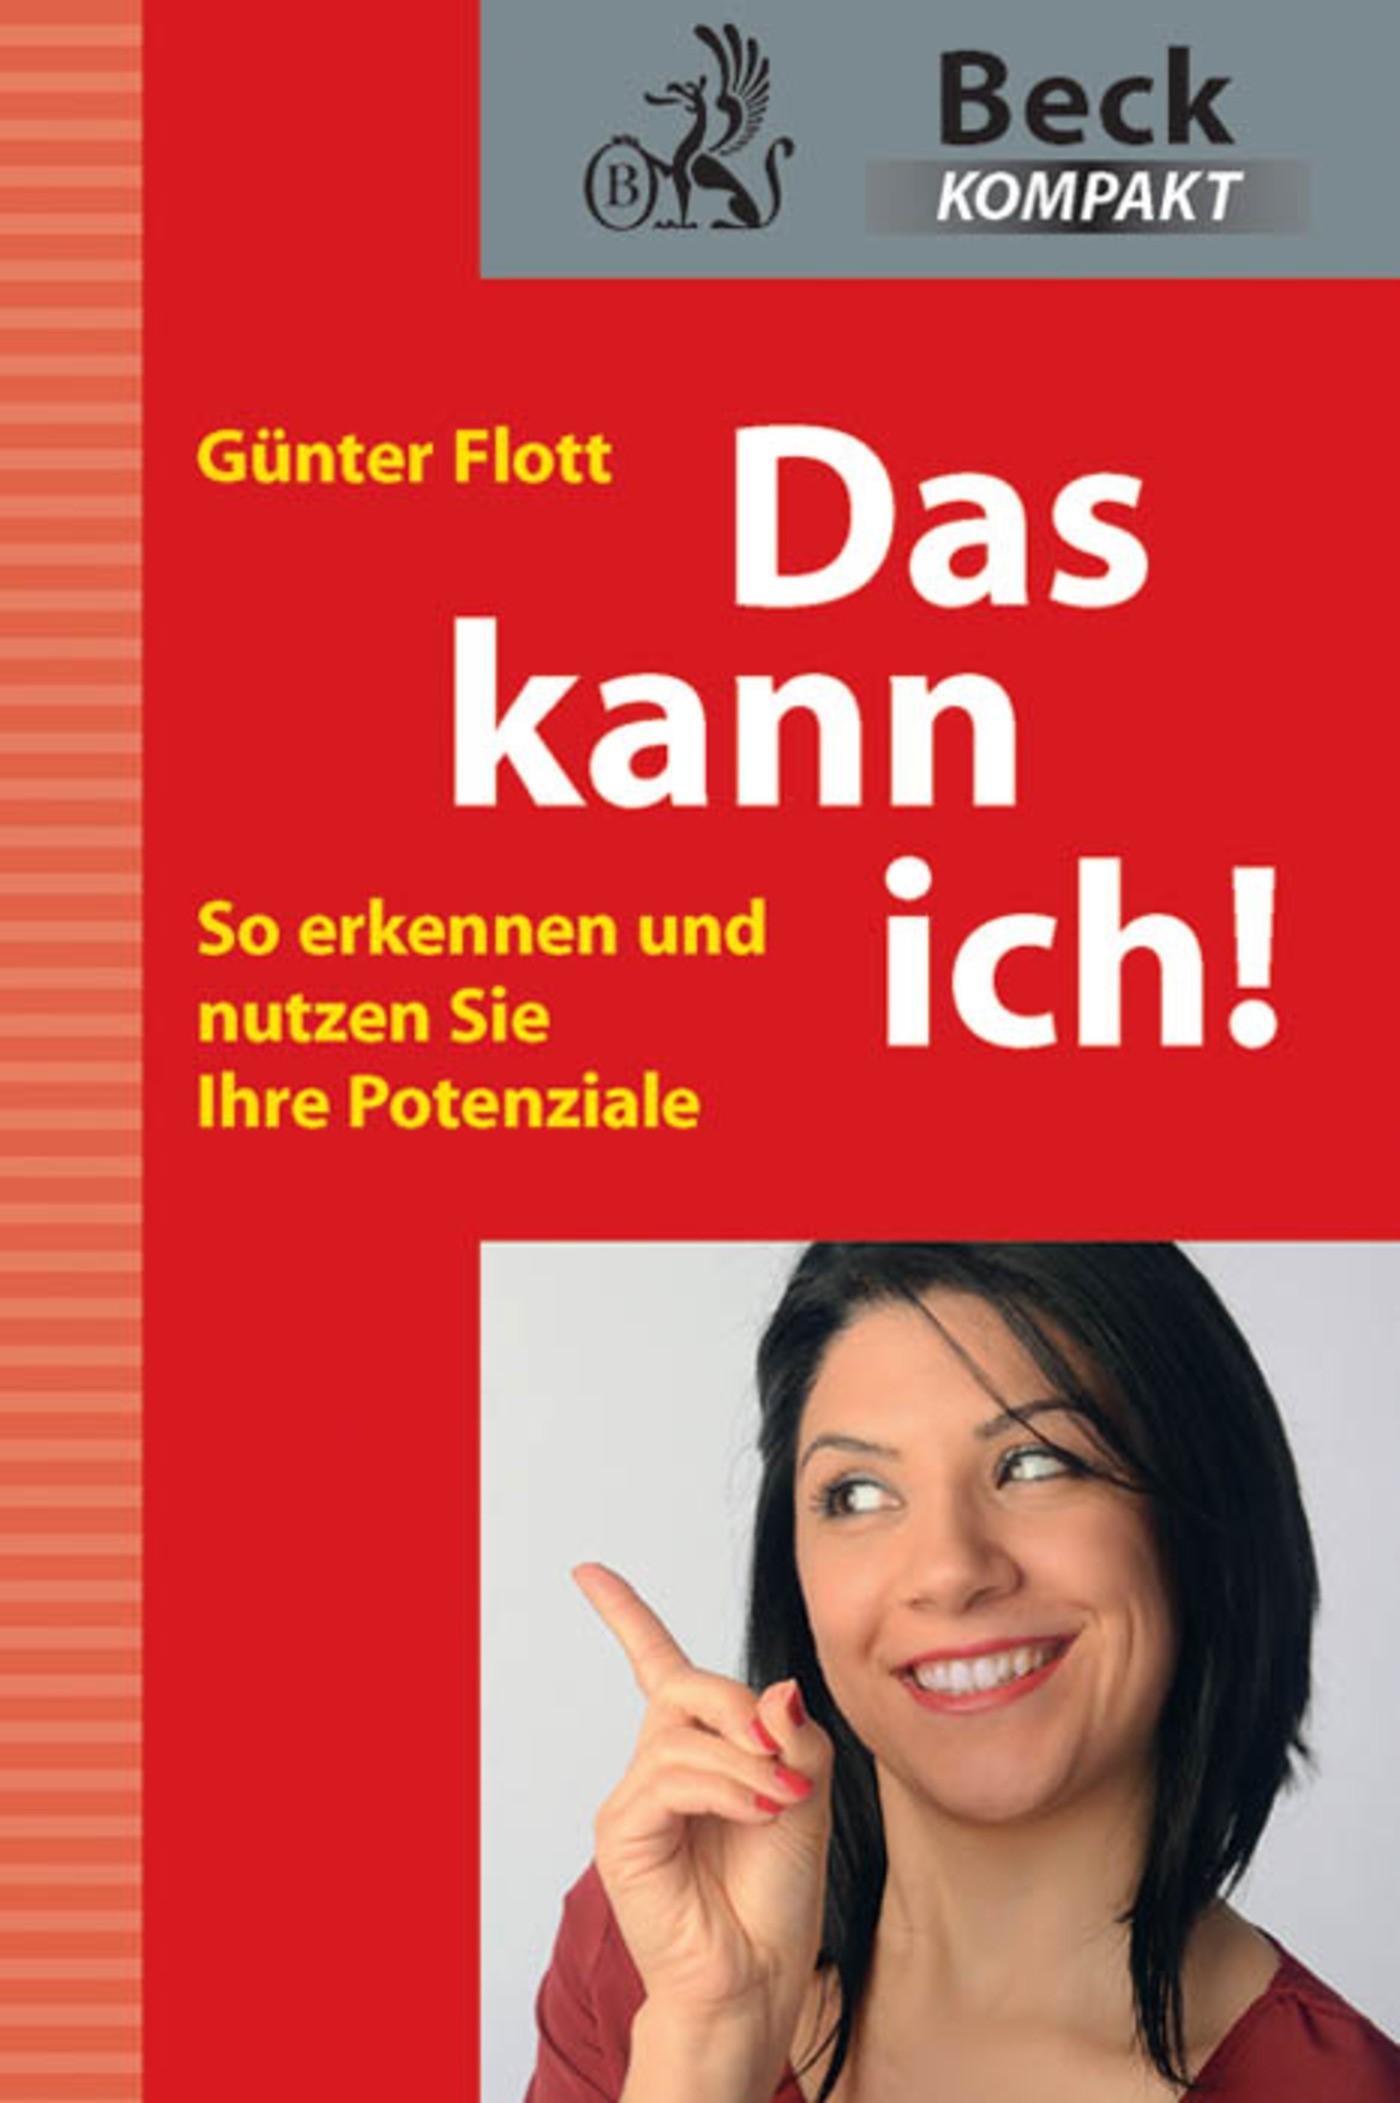 Das kann ich! | Flott, 2012 | eBook (Cover)